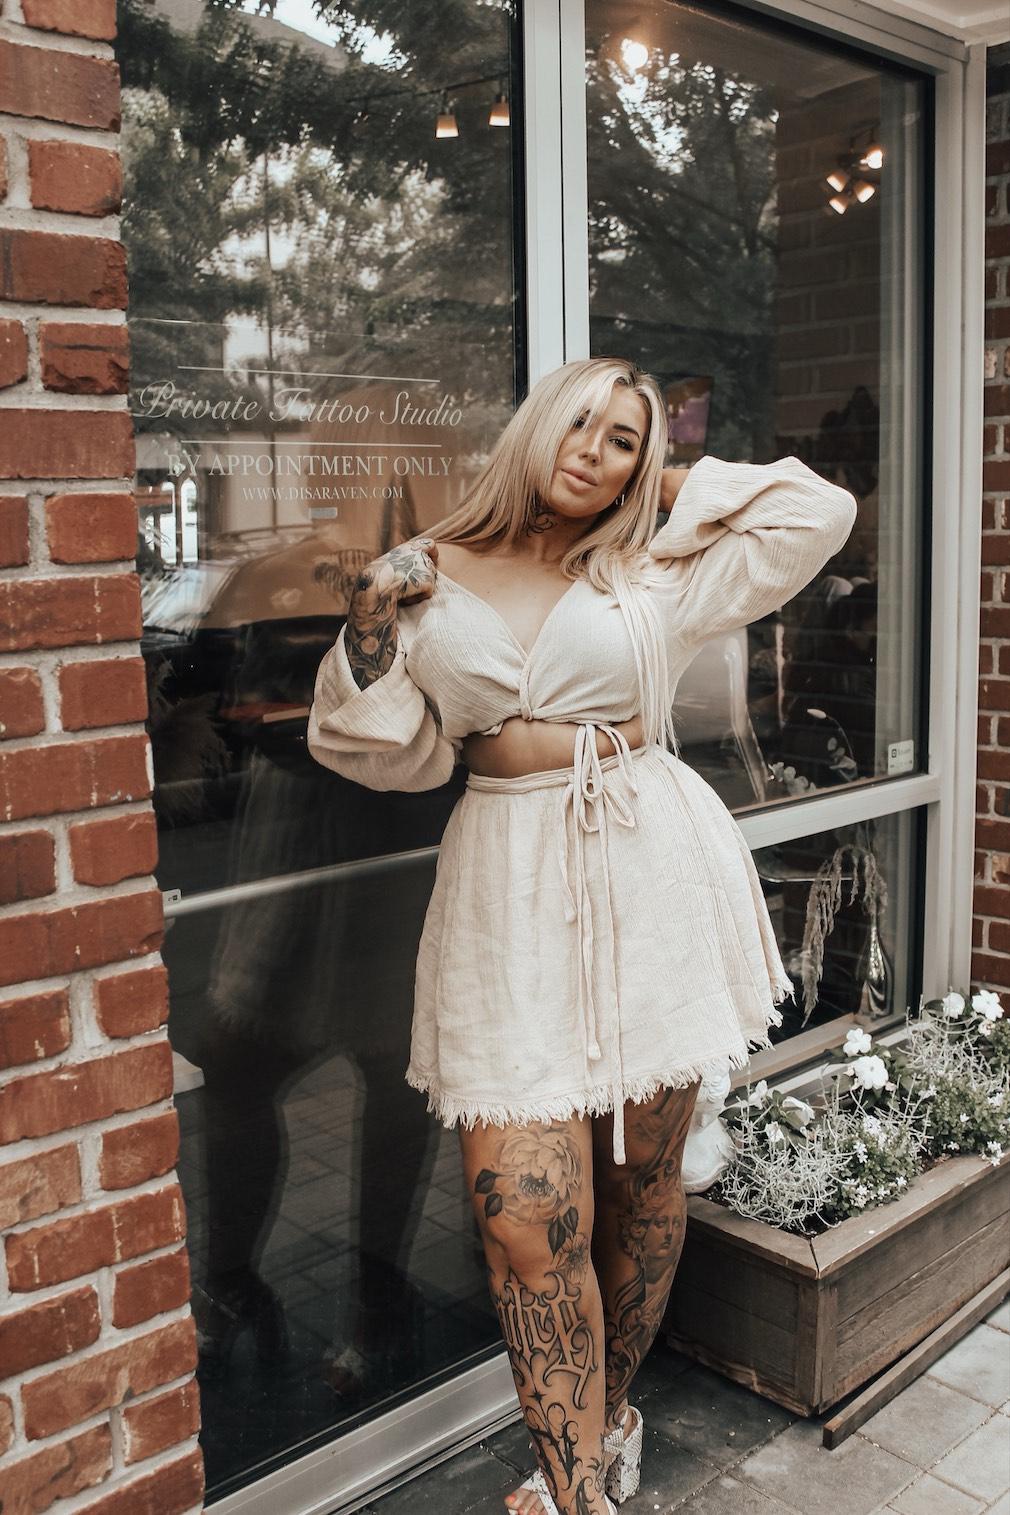 Female tattoo artist Disa Raven